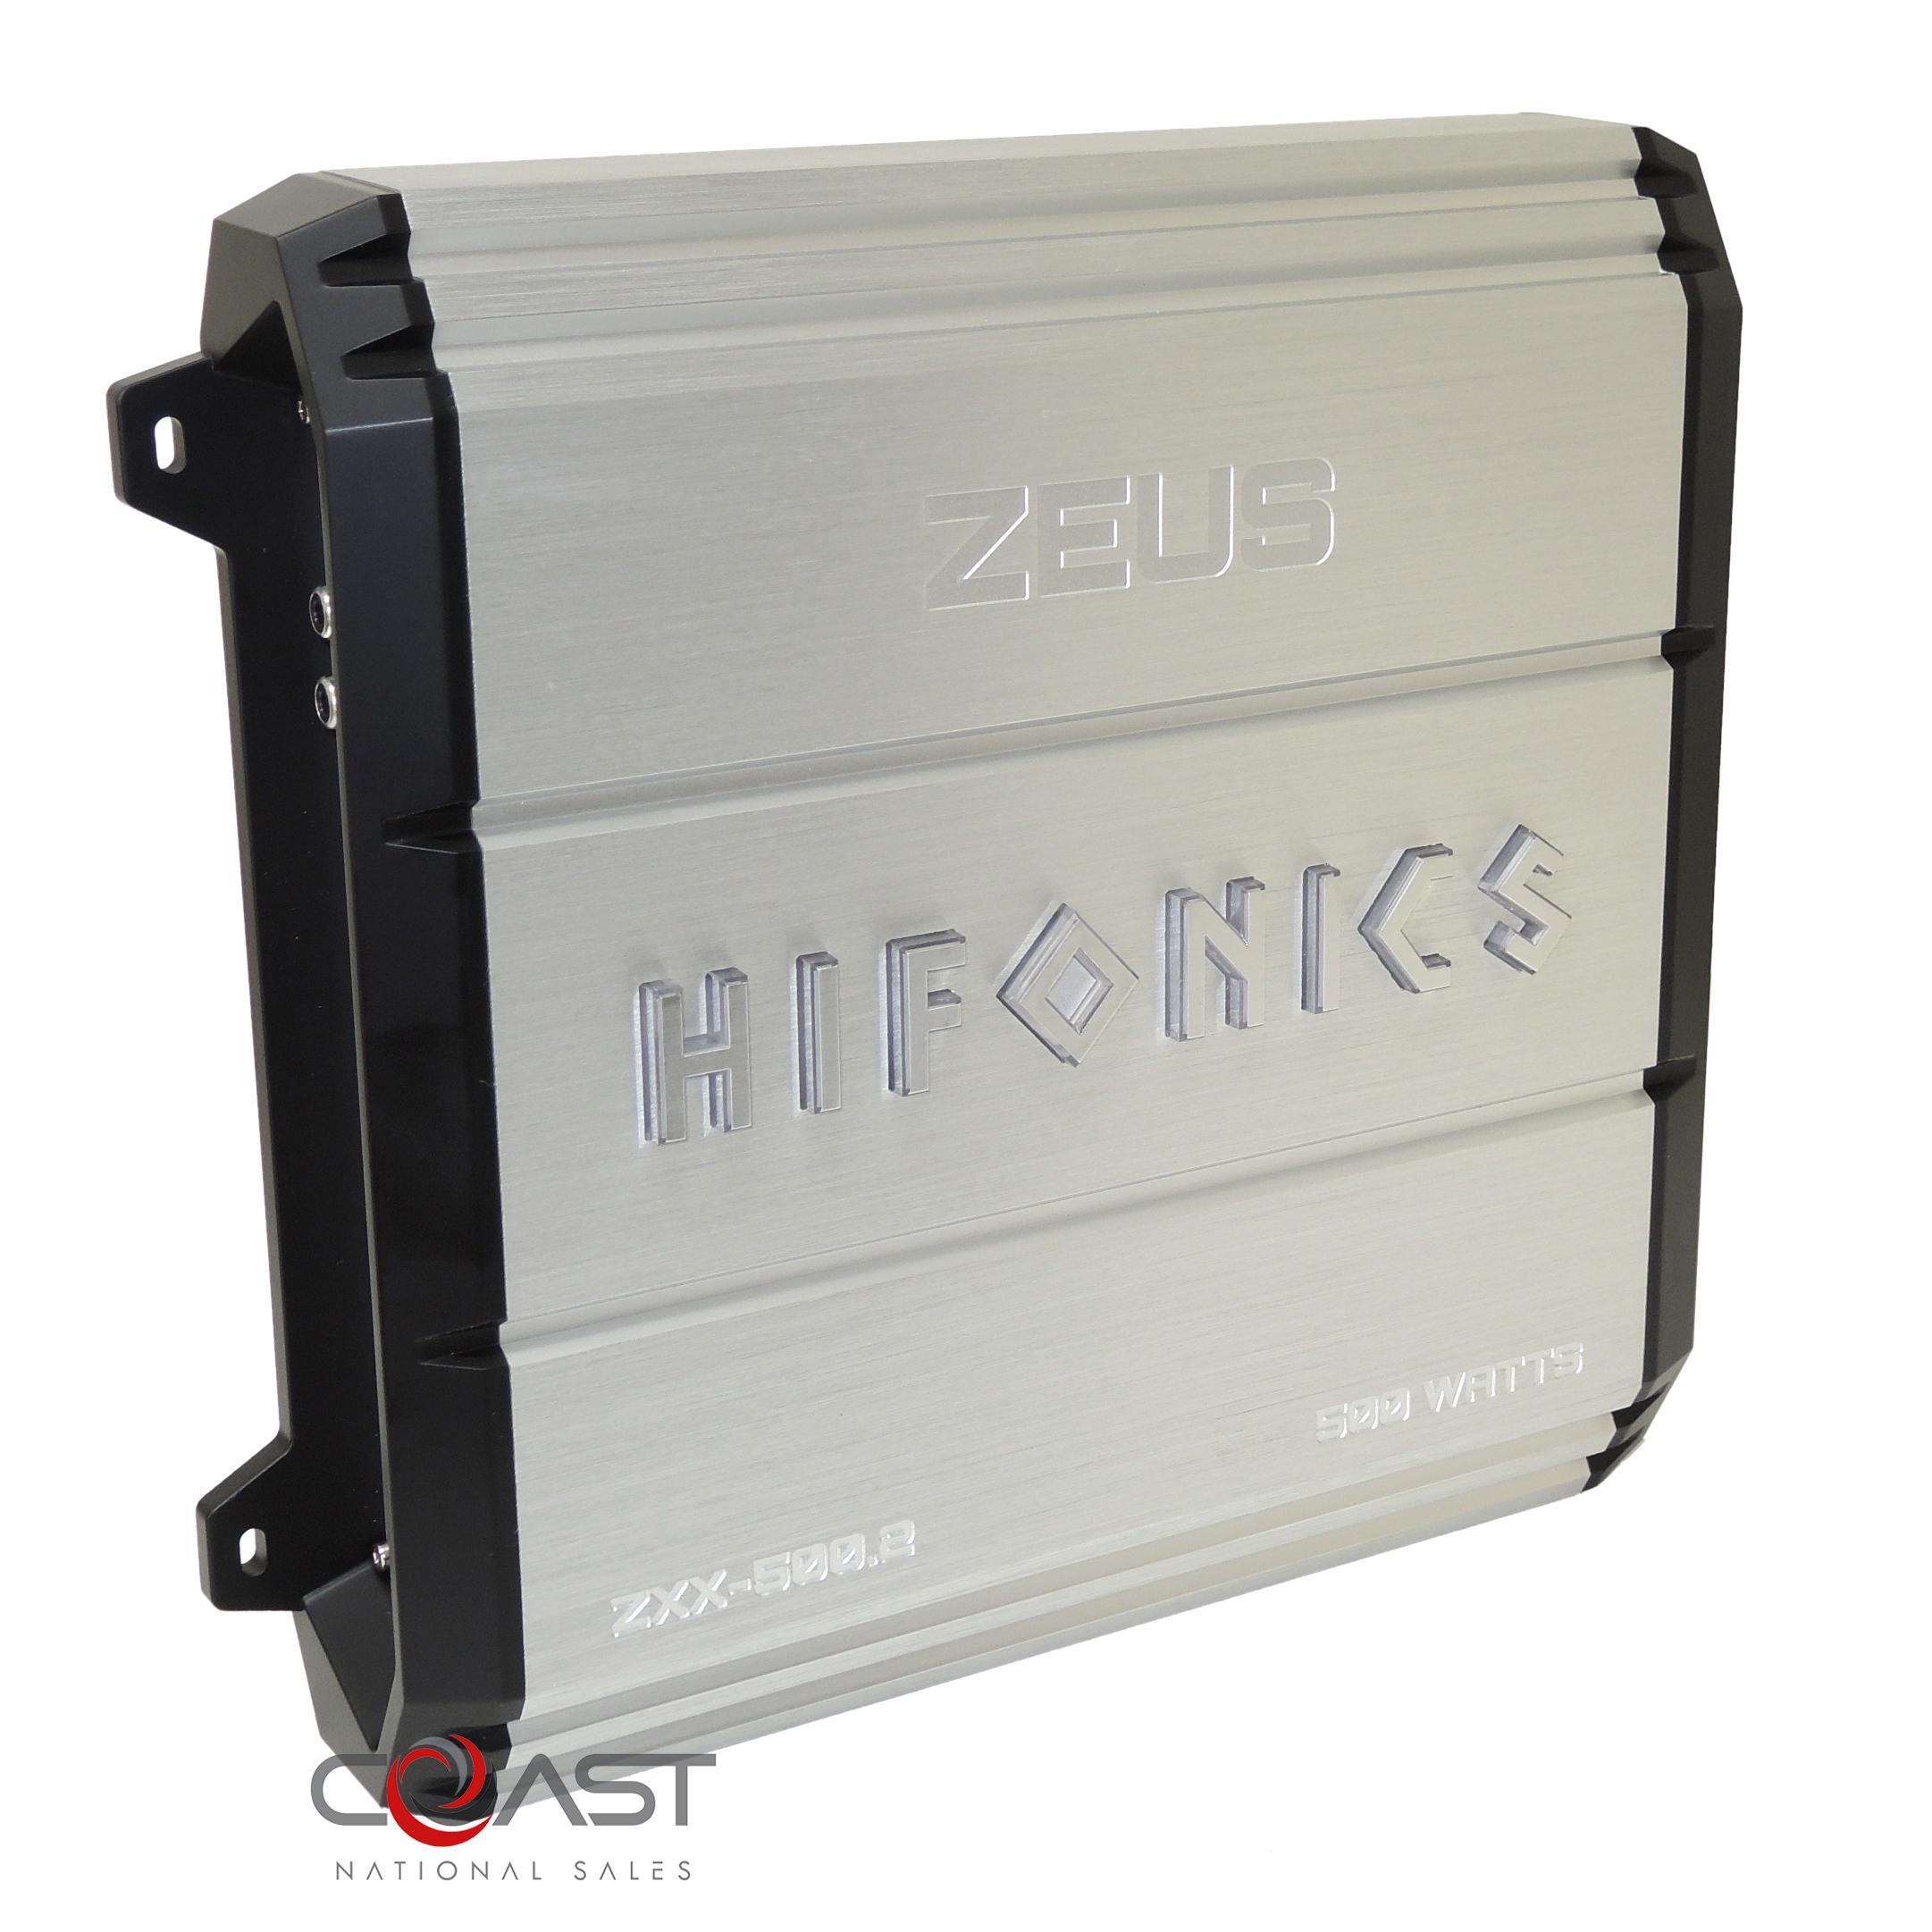 Hifonics Zxx-500.2 Zeus Series 500-watt 2-channel Class Ab Amp